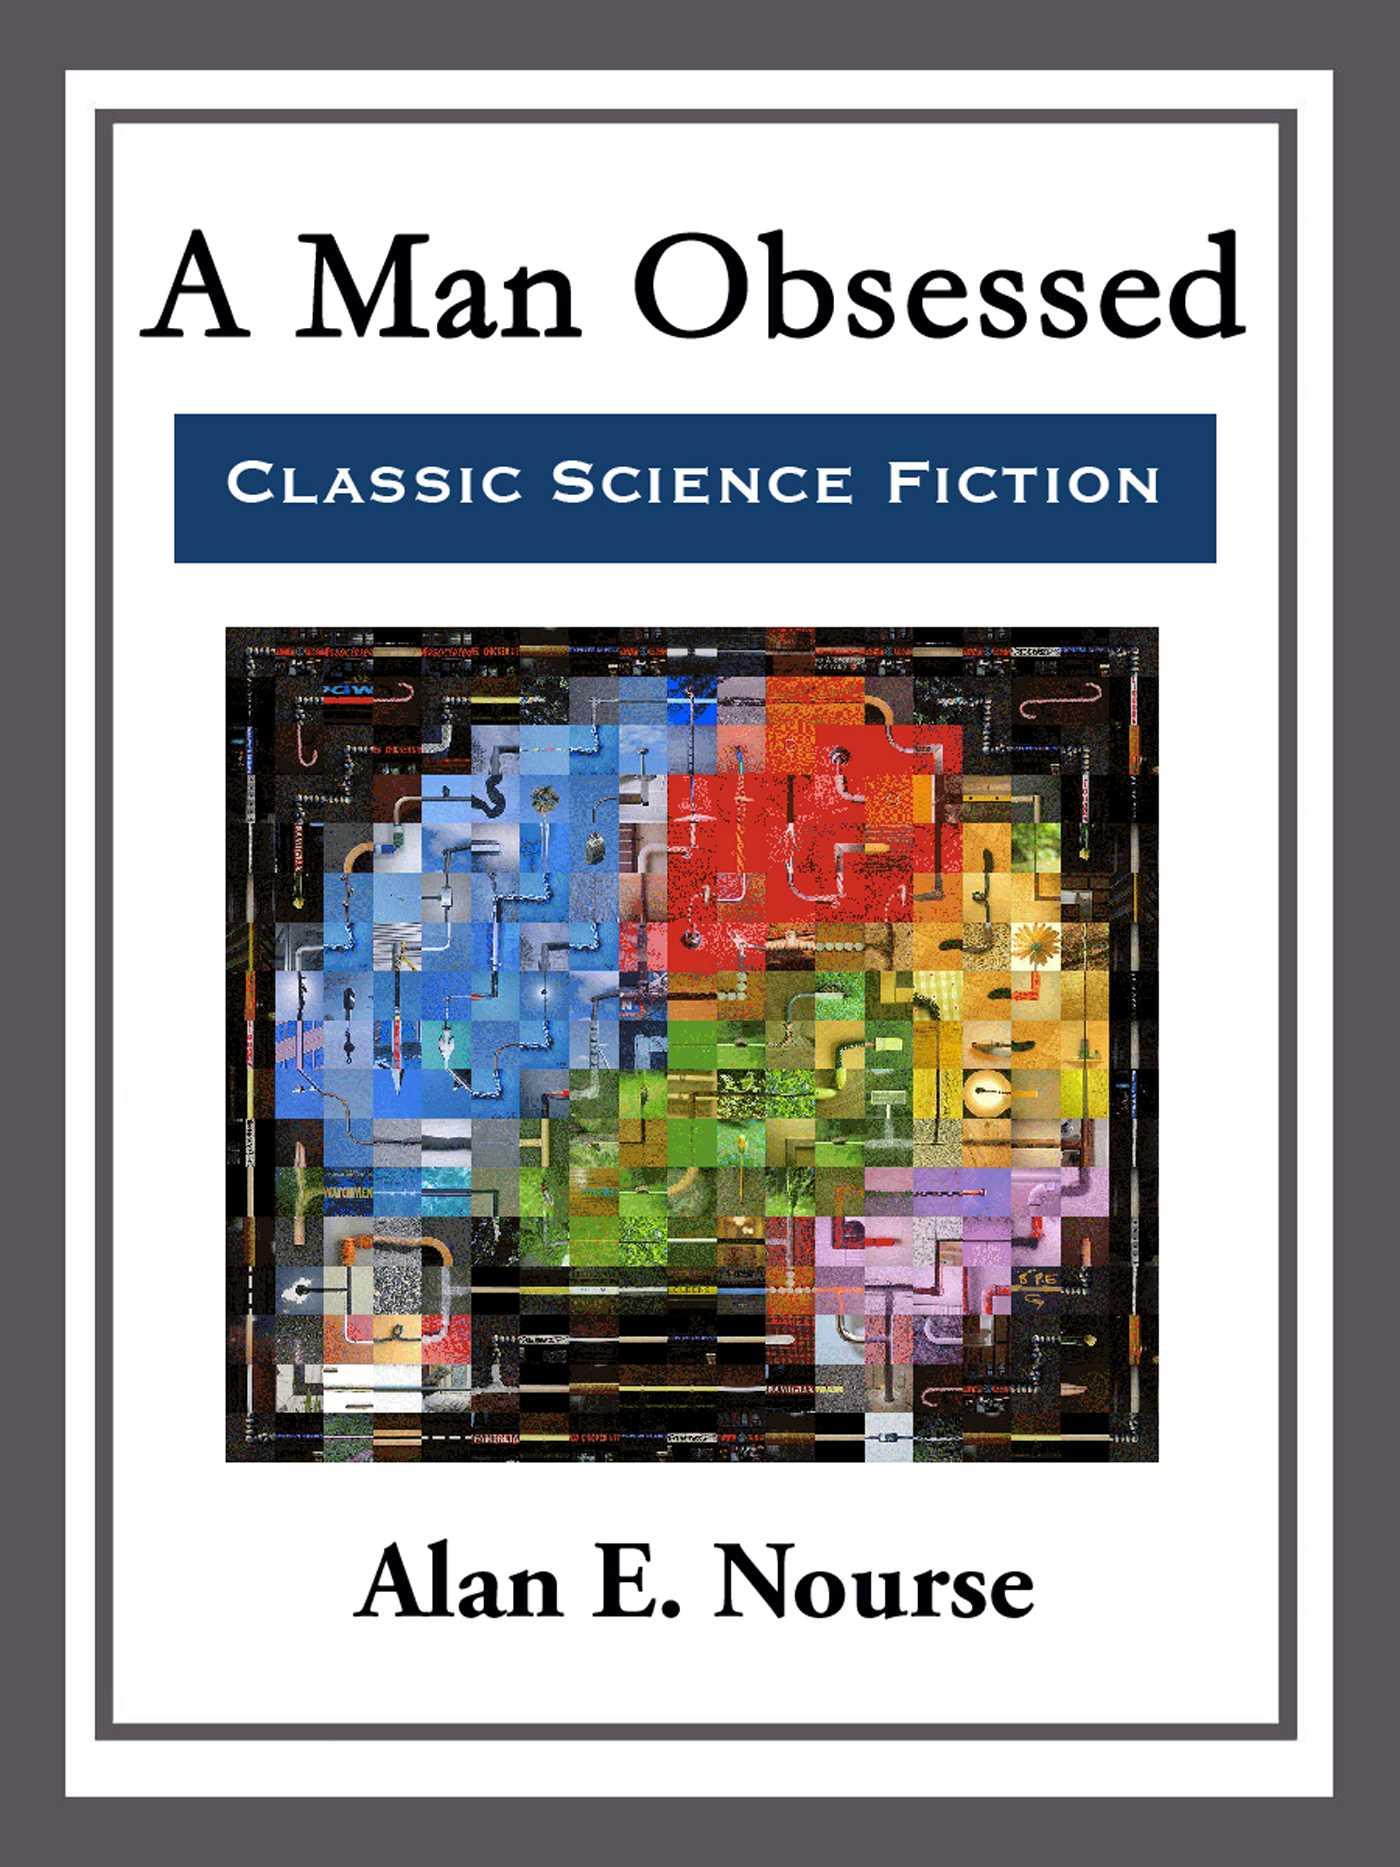 A man obsessed 9781681465005 hr